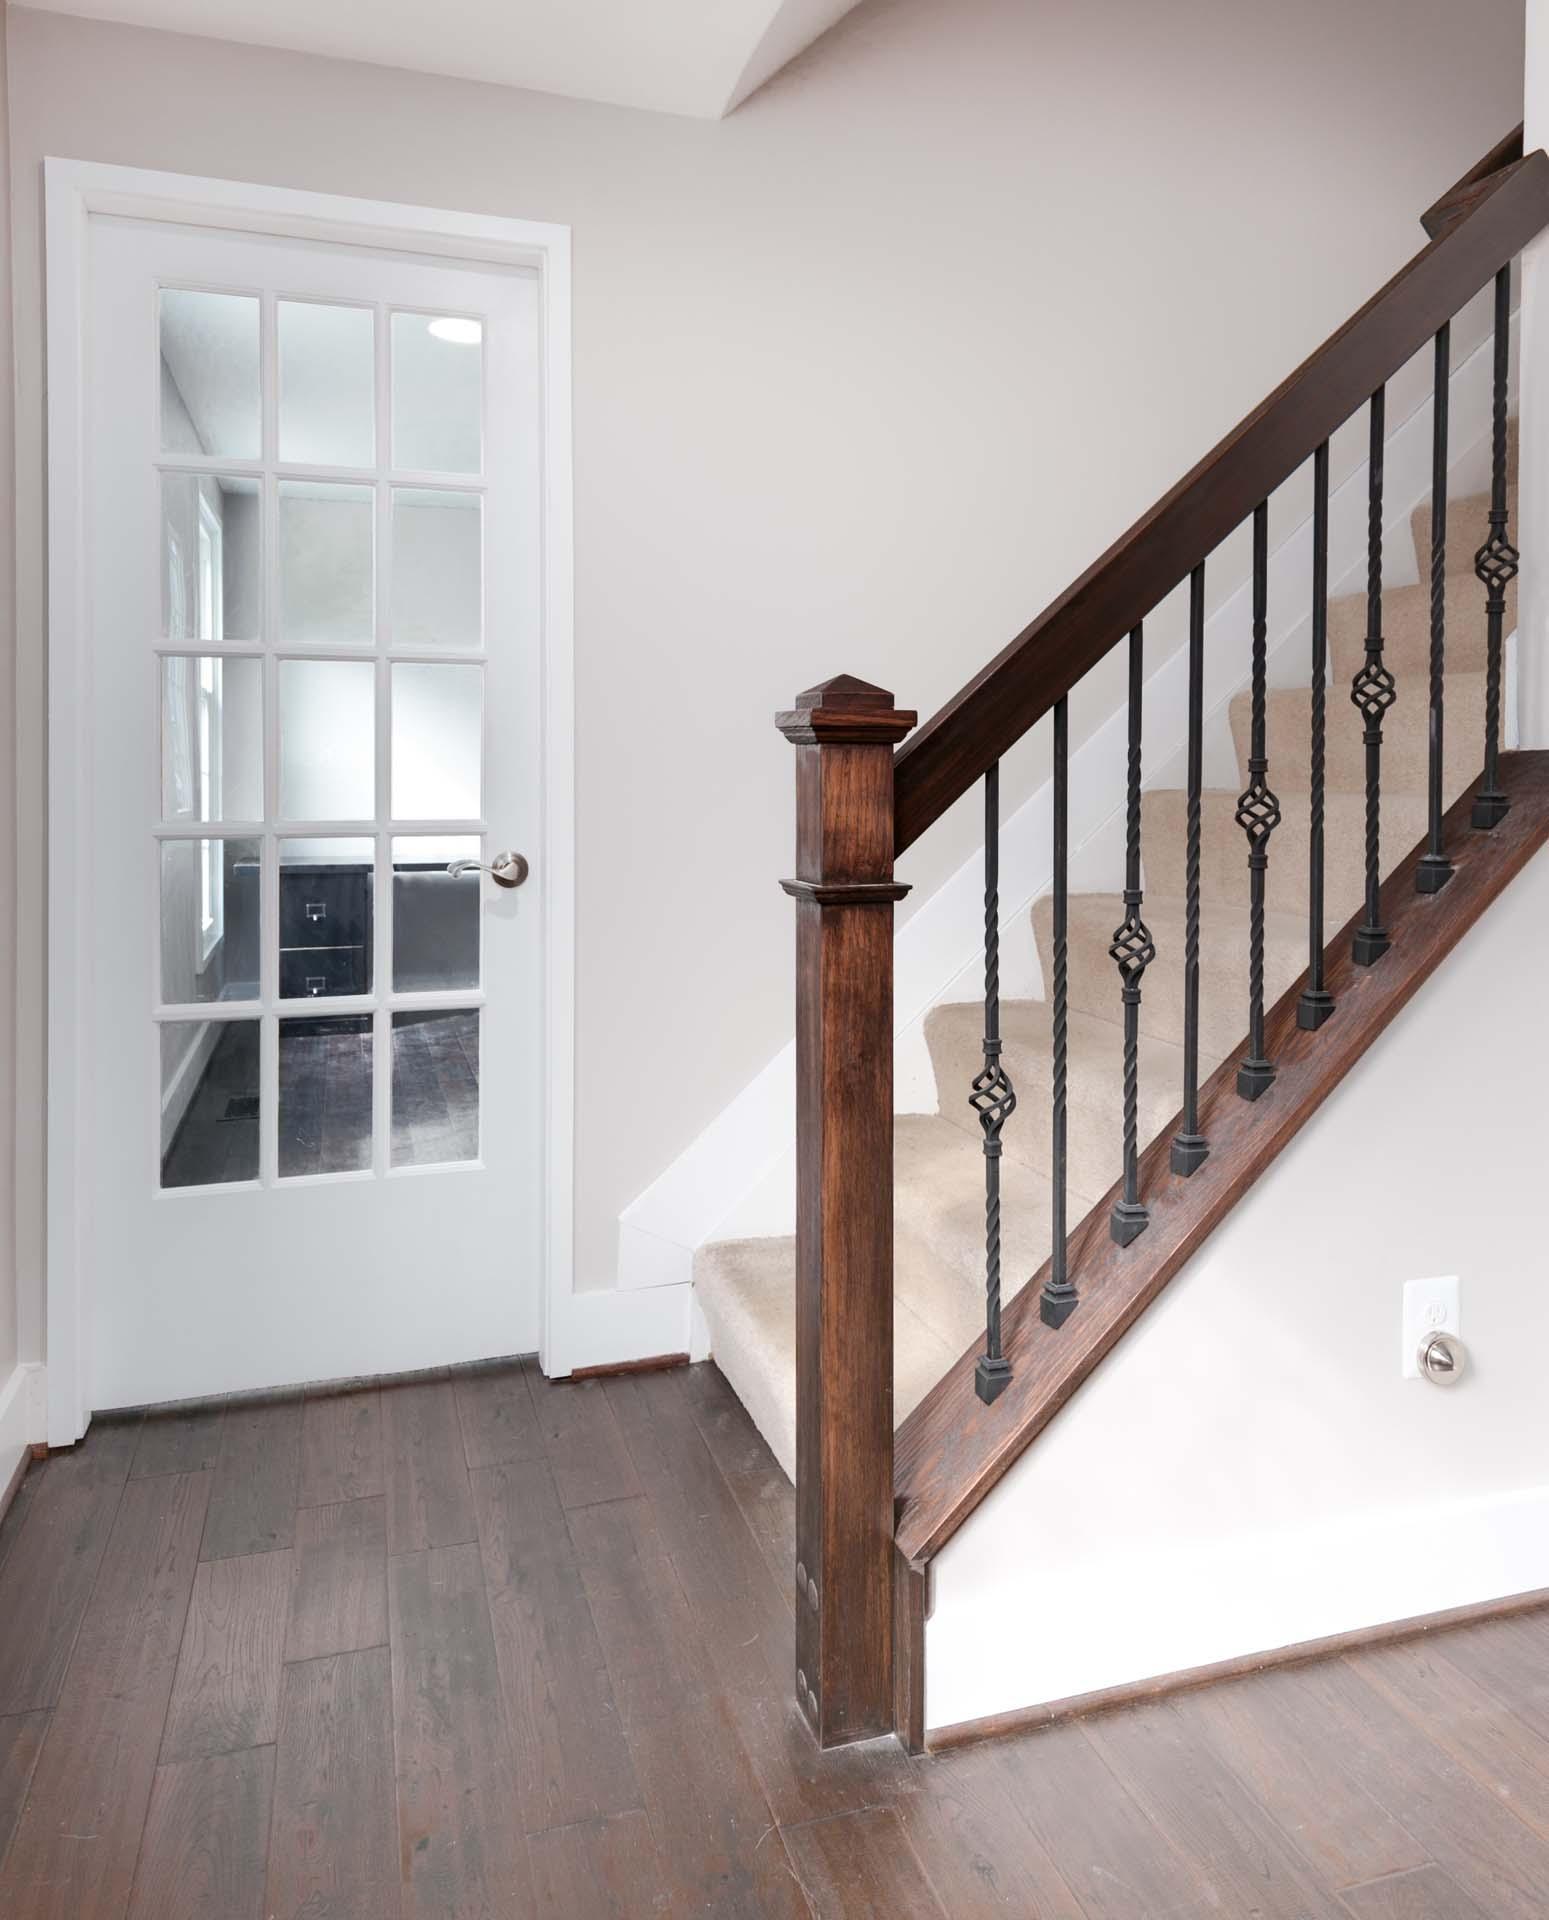 011 Stair